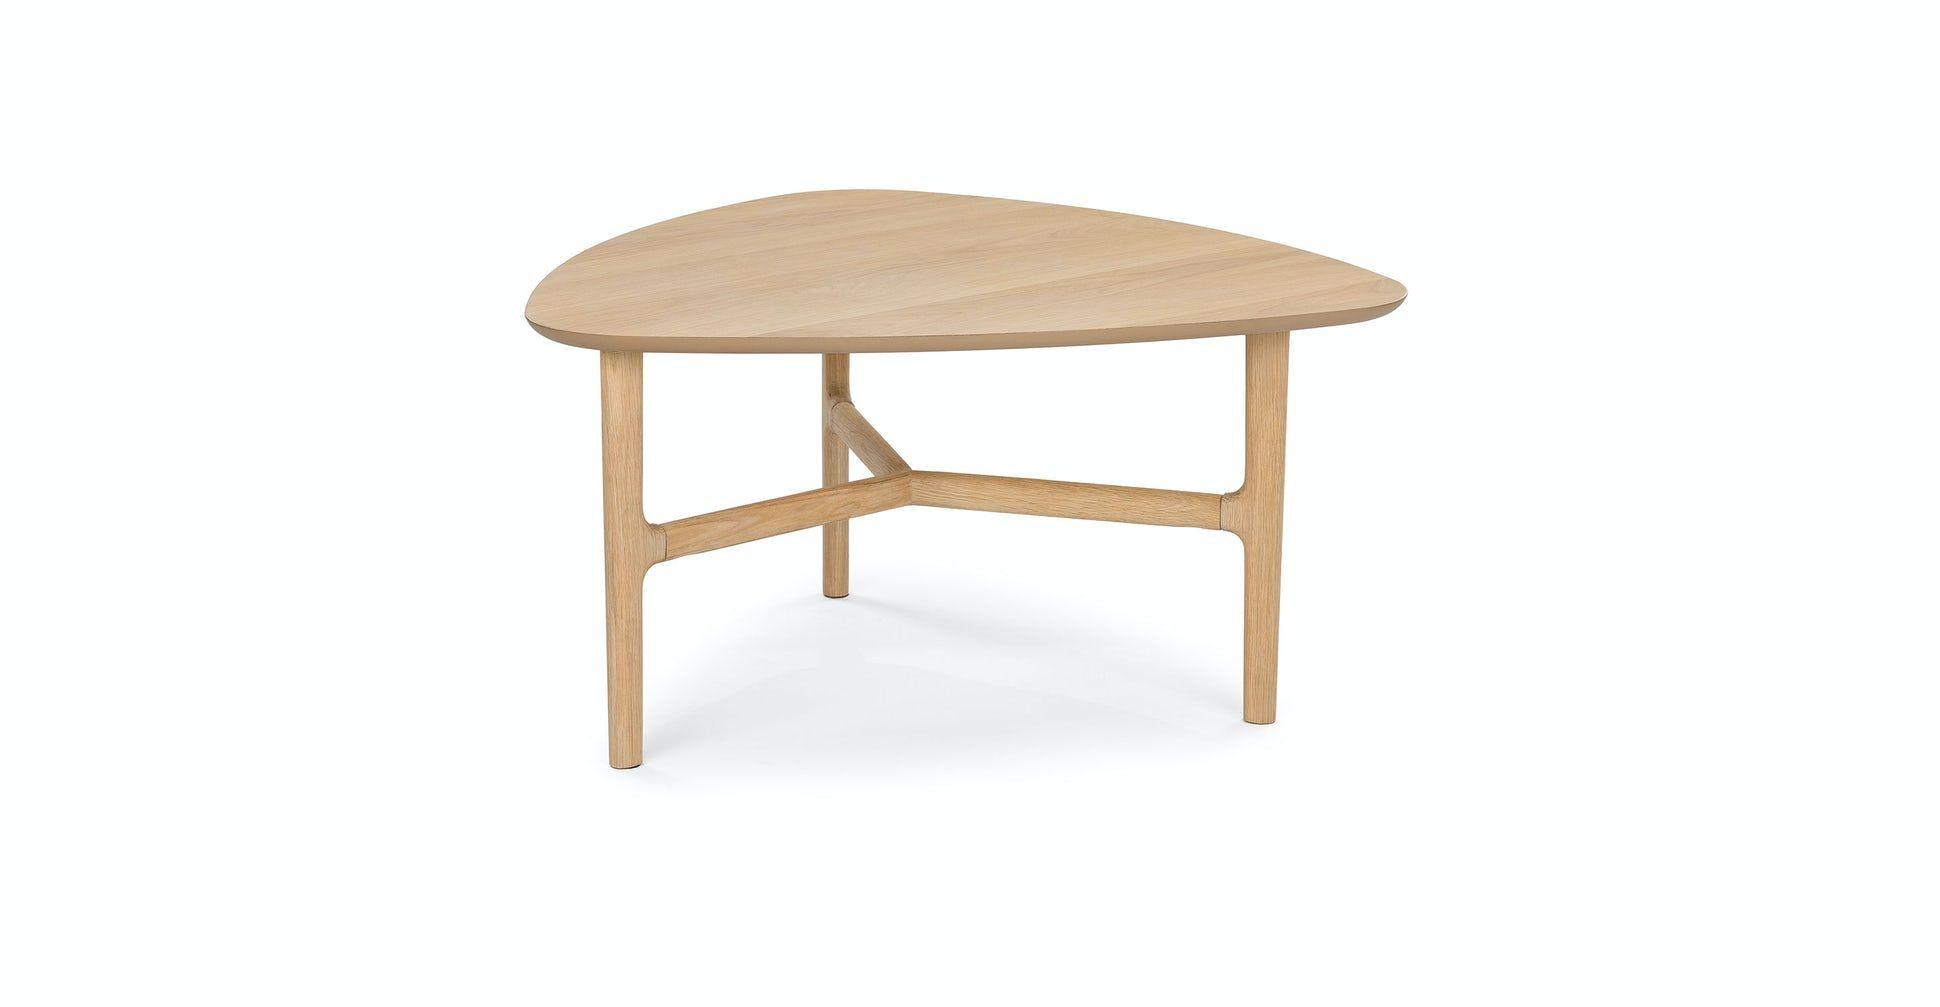 Brezza Light Oak Triangular Coffee Table In 2021 Mid Century Modern Coffee Table Coffee Table Modern Coffee Table Decor [ 1007 x 1940 Pixel ]